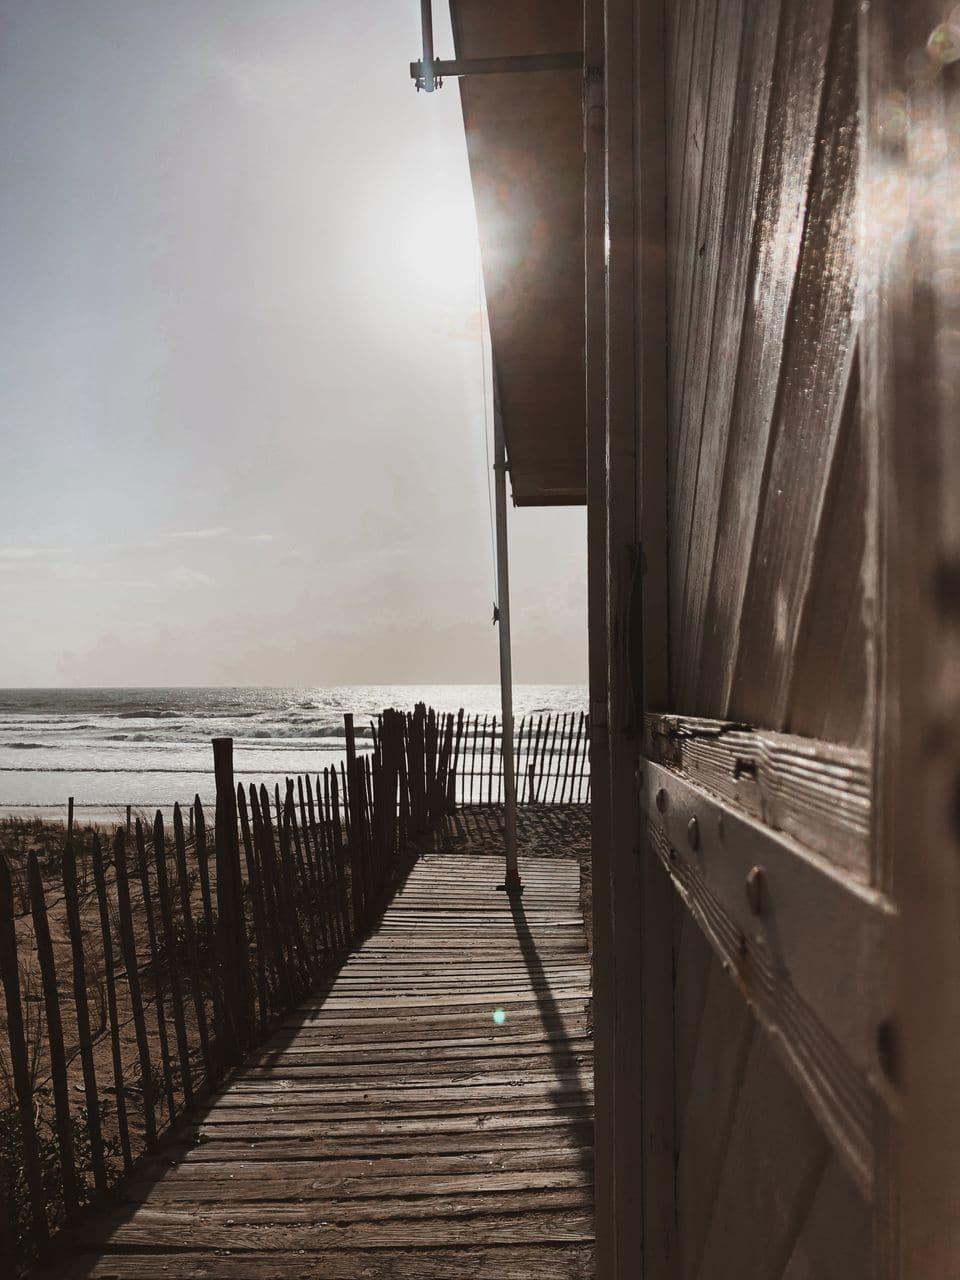 LACANAU OCEAN - LES BONNES ADRESSES (2)